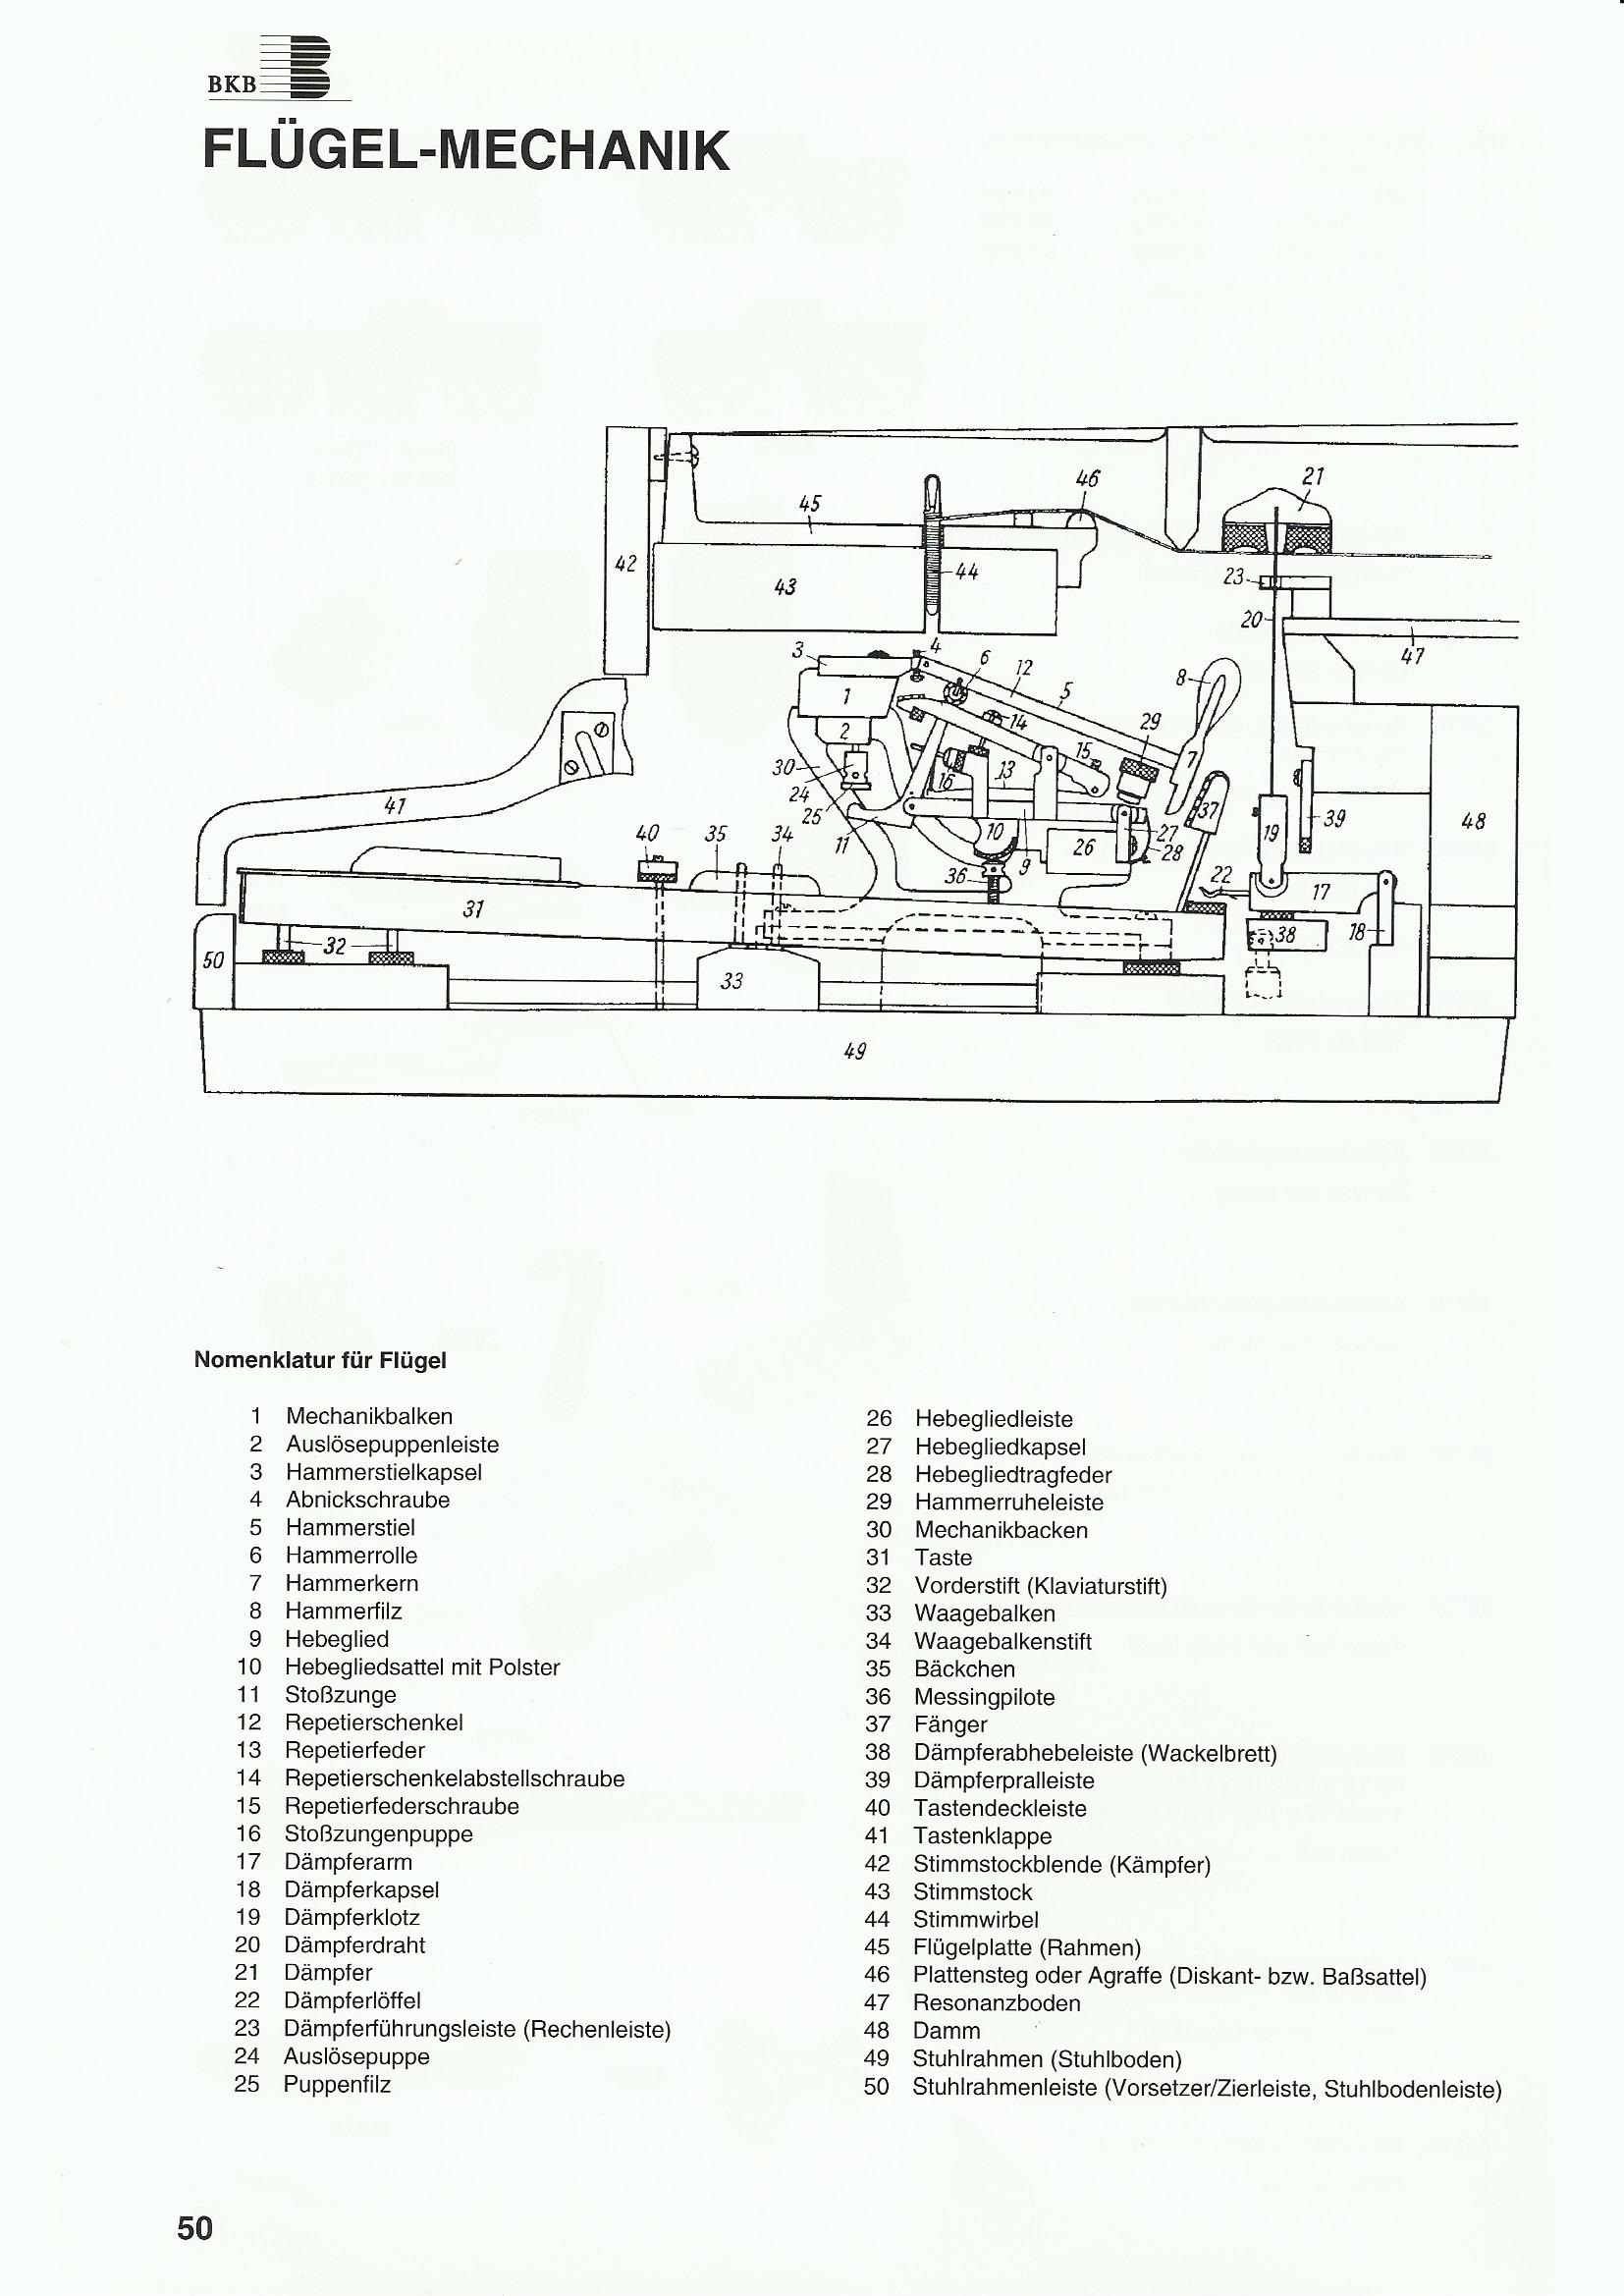 5aeab6cf51ea3-vleugelmechanik